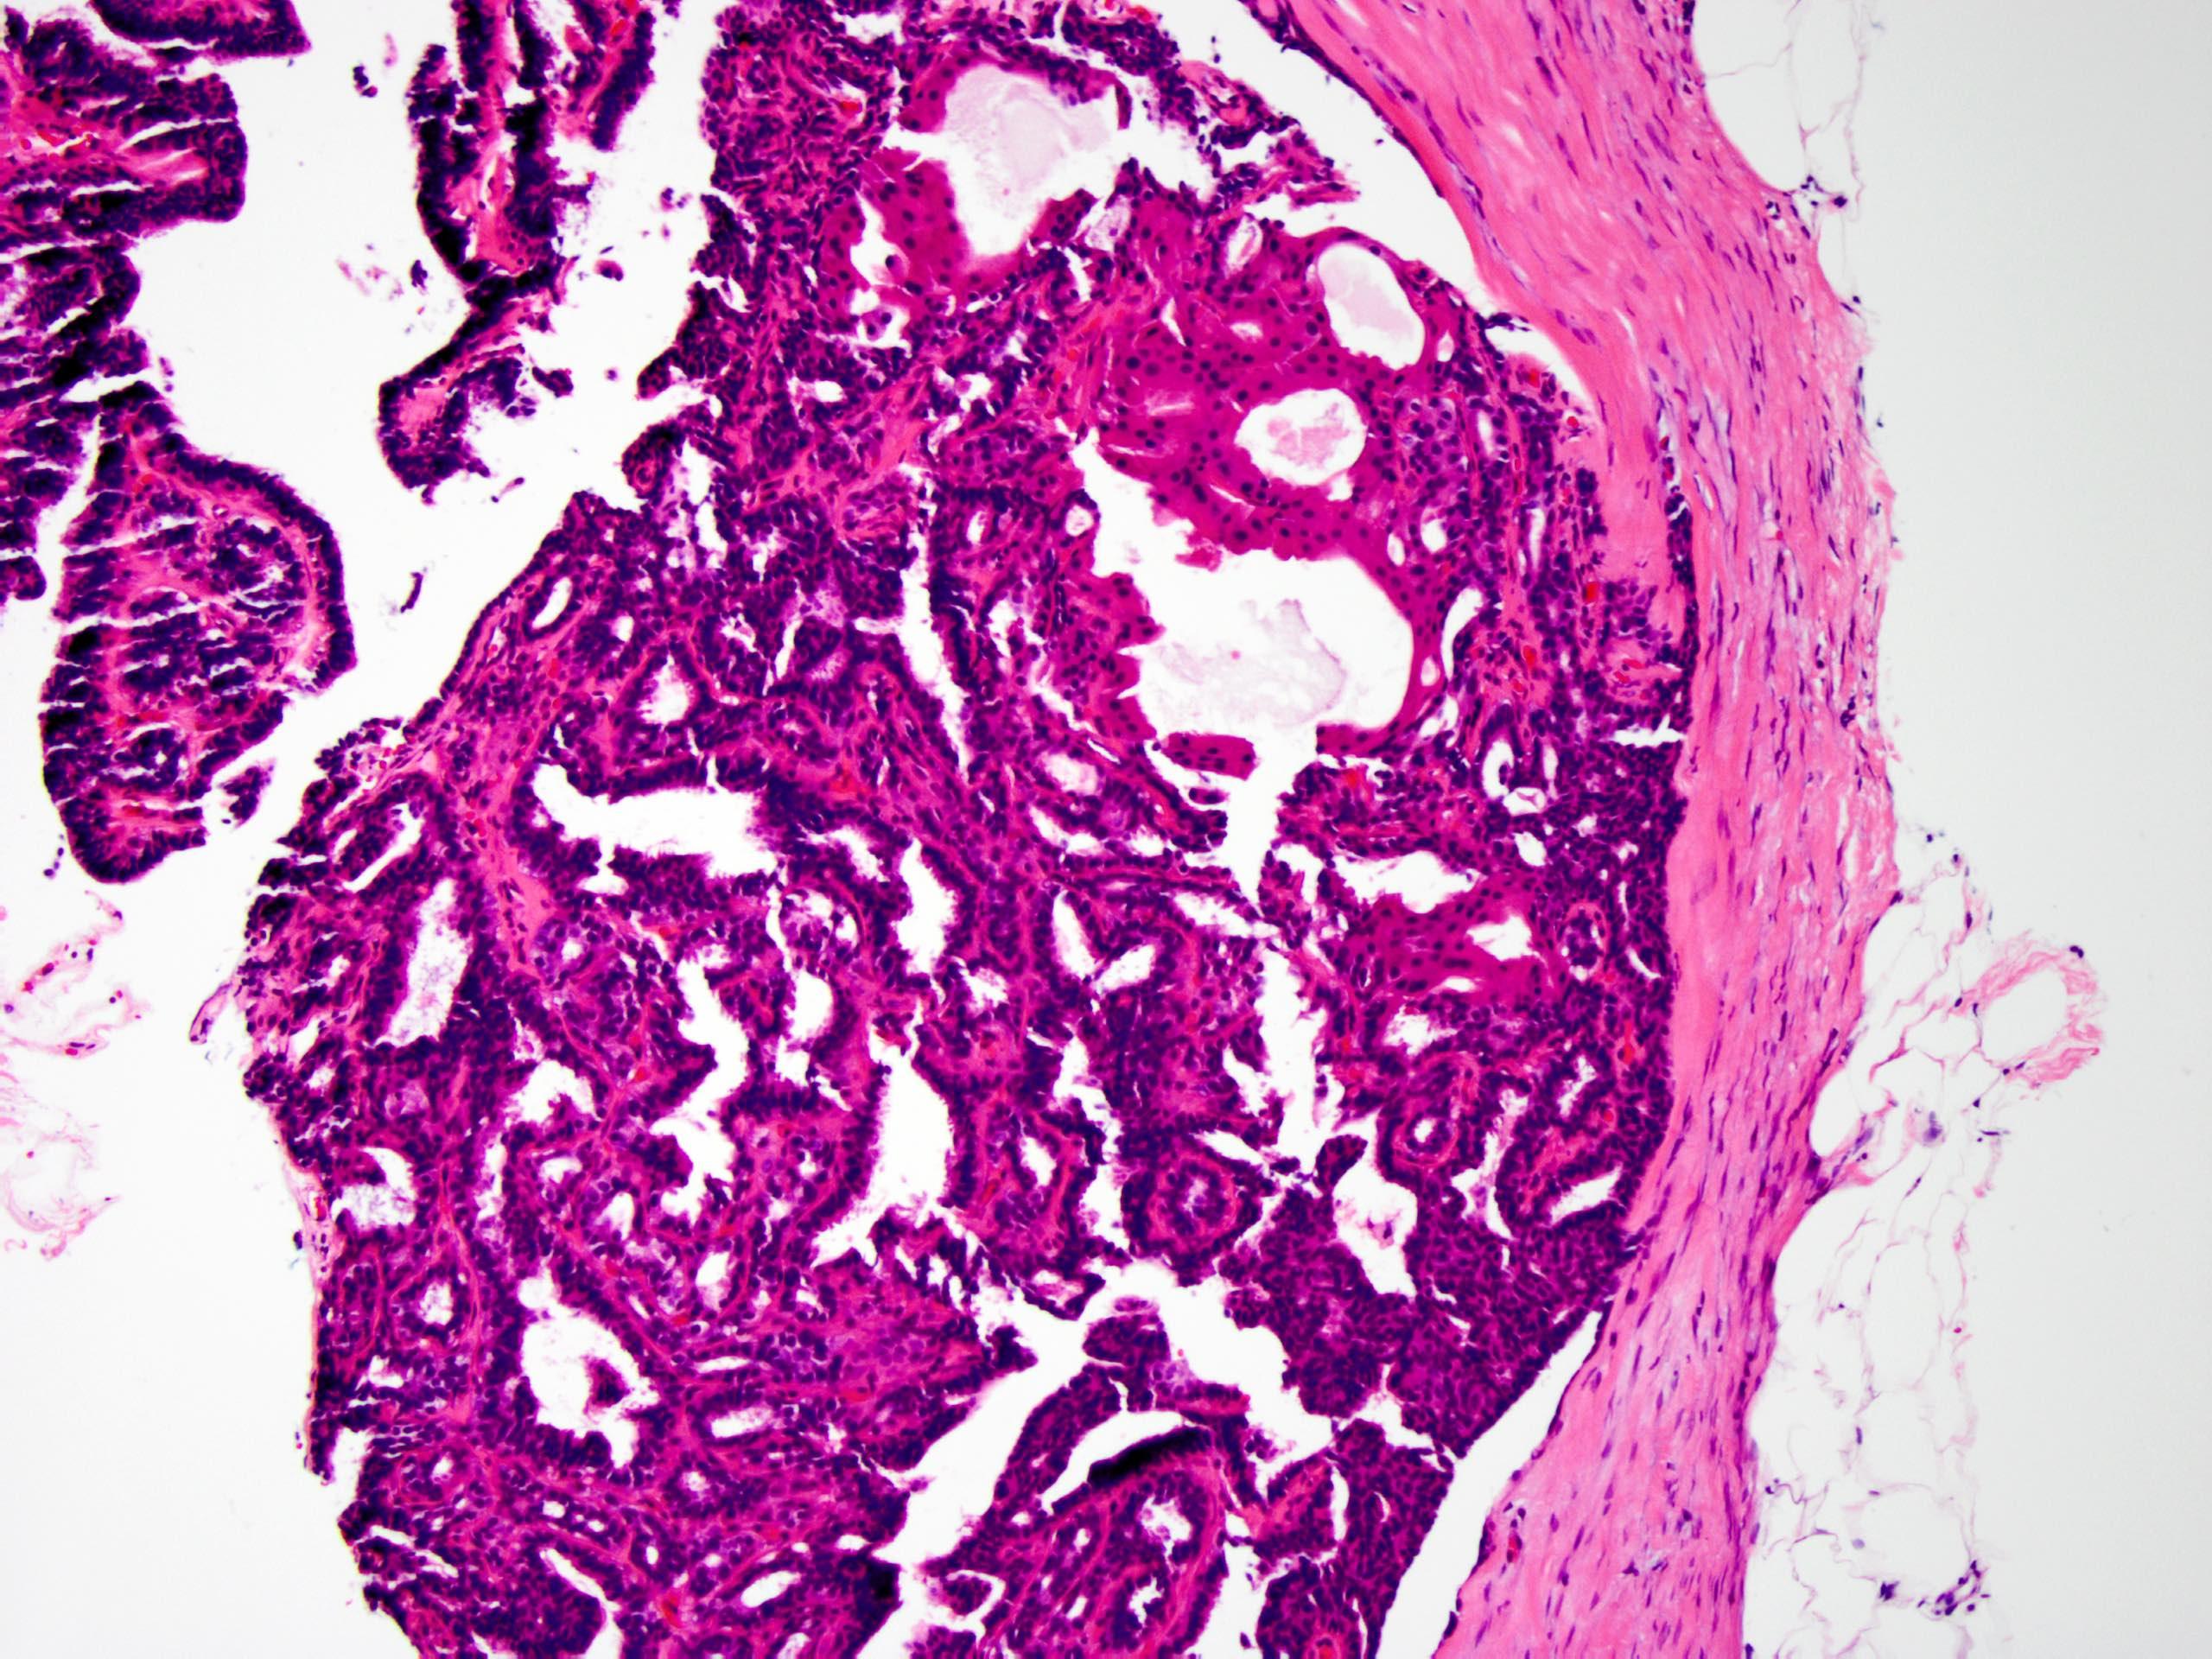 ductalis papilloma patológia körvonalai)